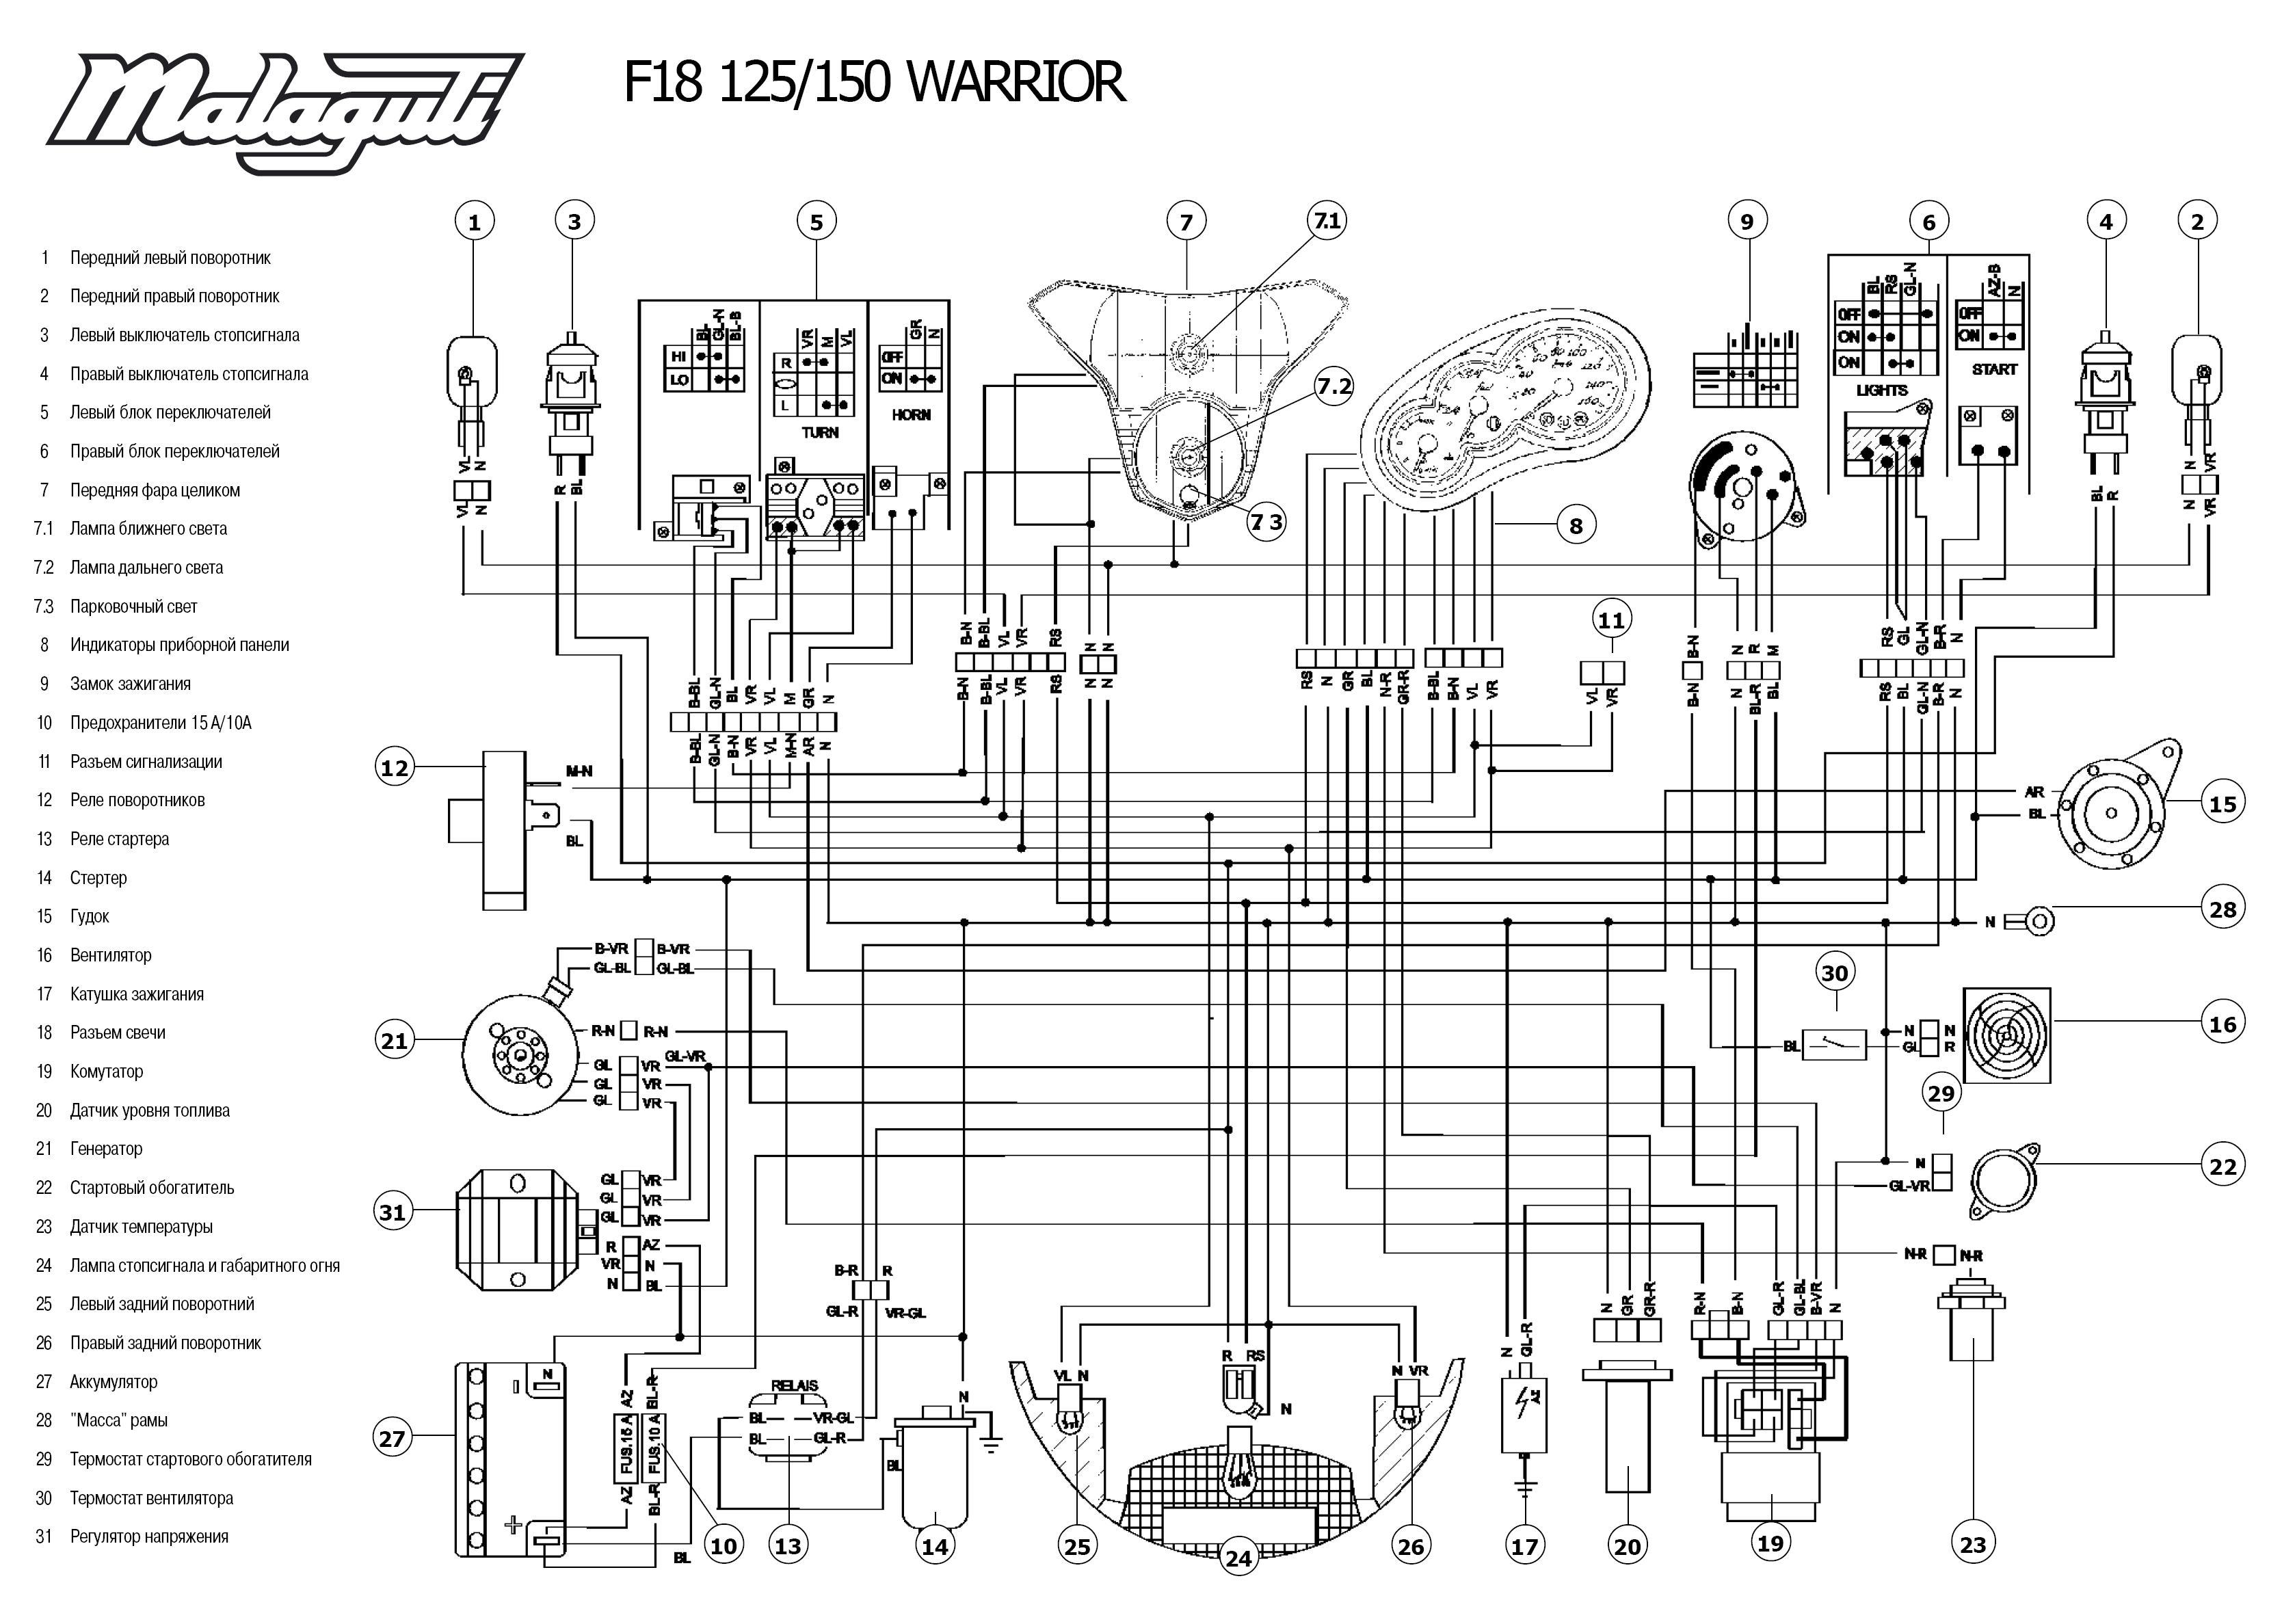 Schema Elettrico Phantom F12 : Malaguti motorcycle manuals pdf wiring diagrams fault